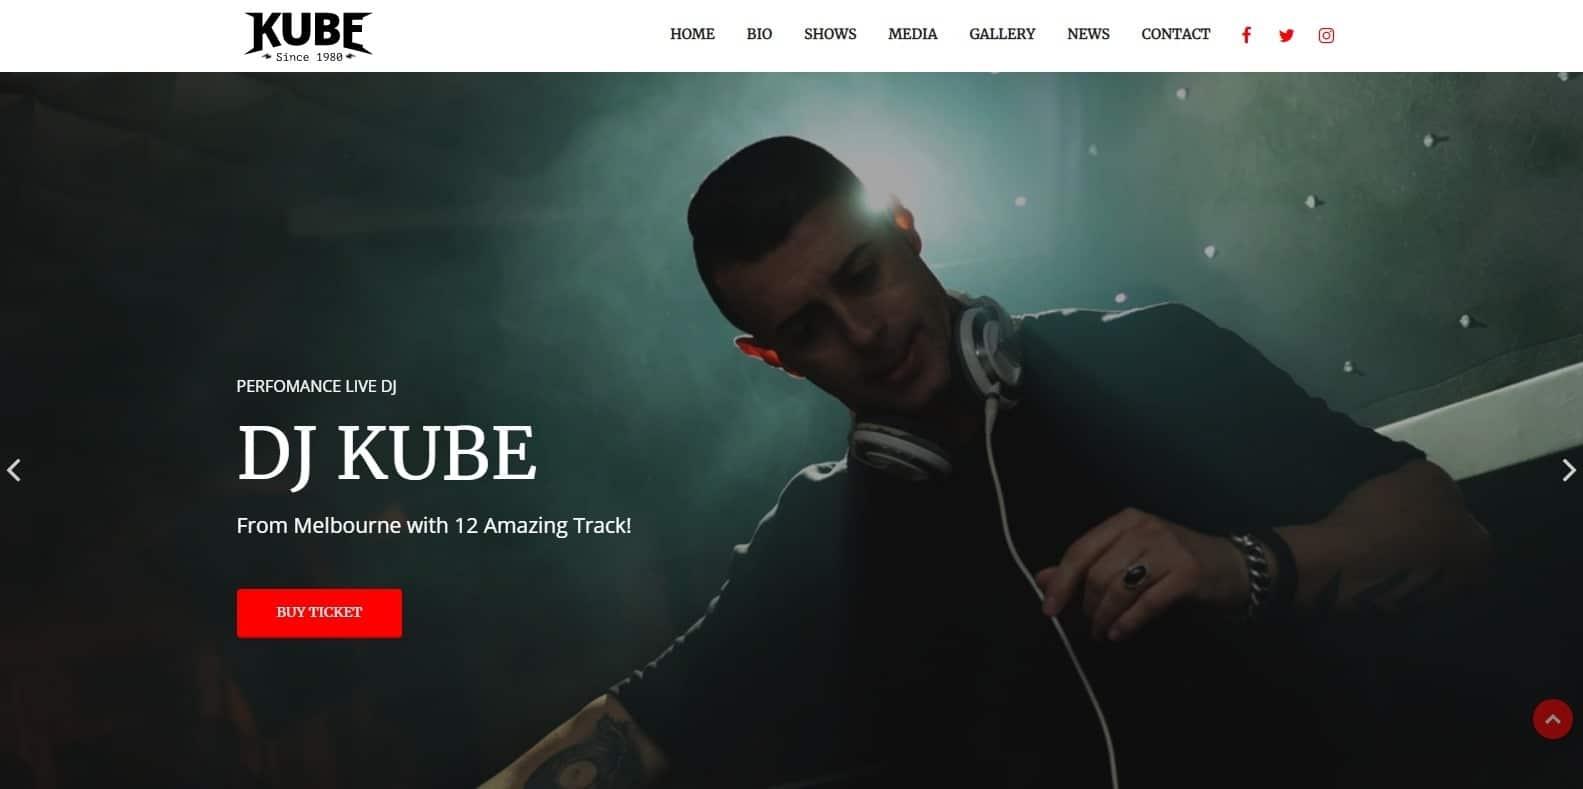 kube-dj-website-template